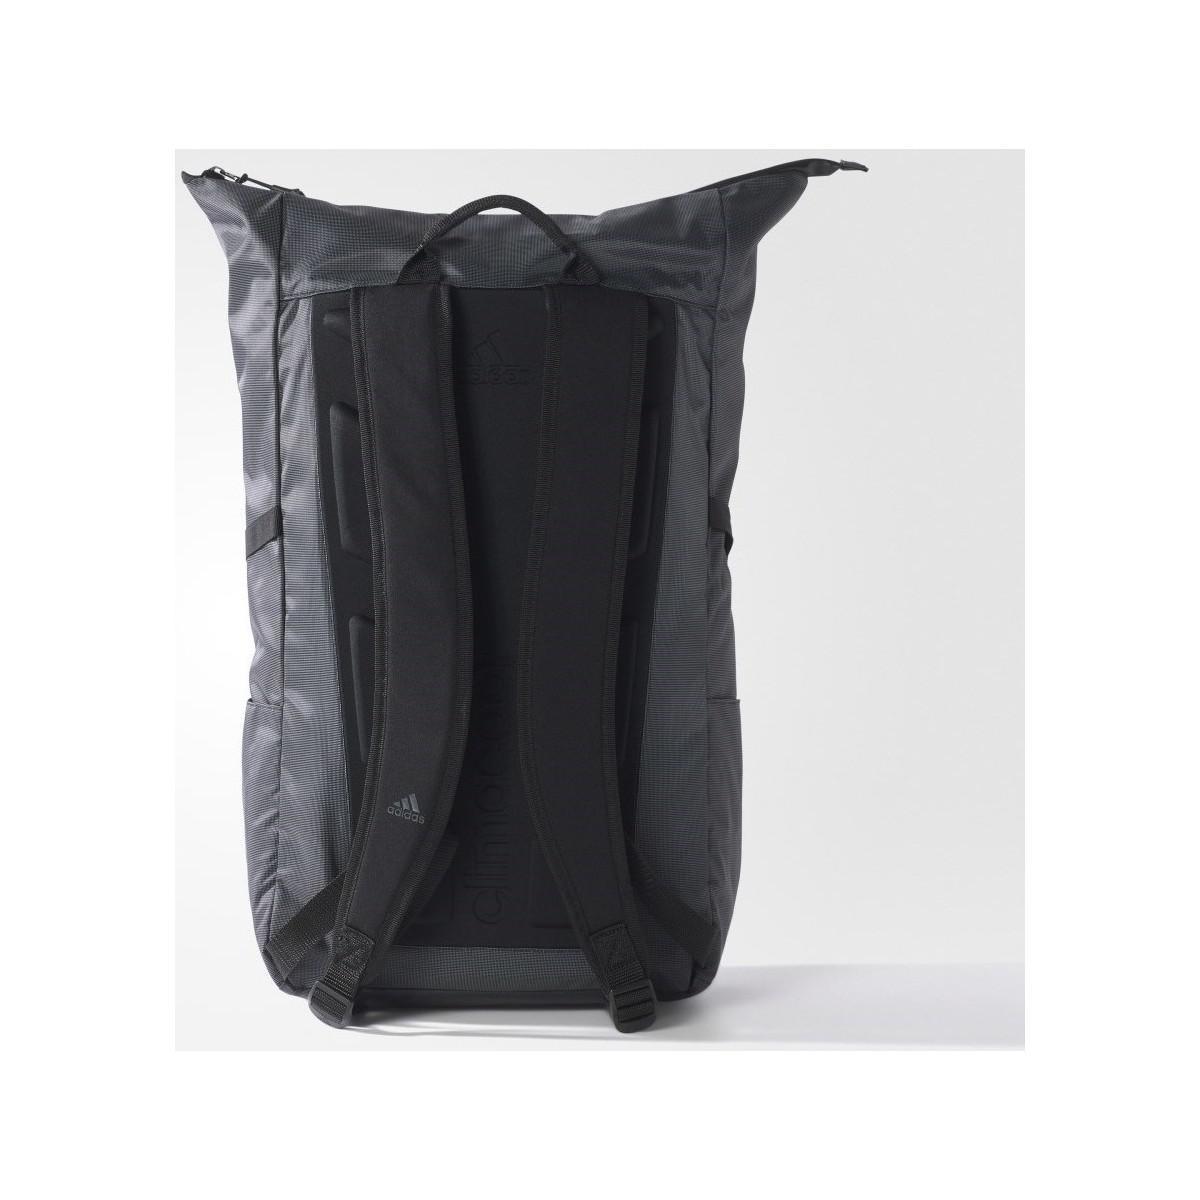 f3fac6f84351 adidas Zne Sideline Men s Backpack In Black in Black for Men - Lyst